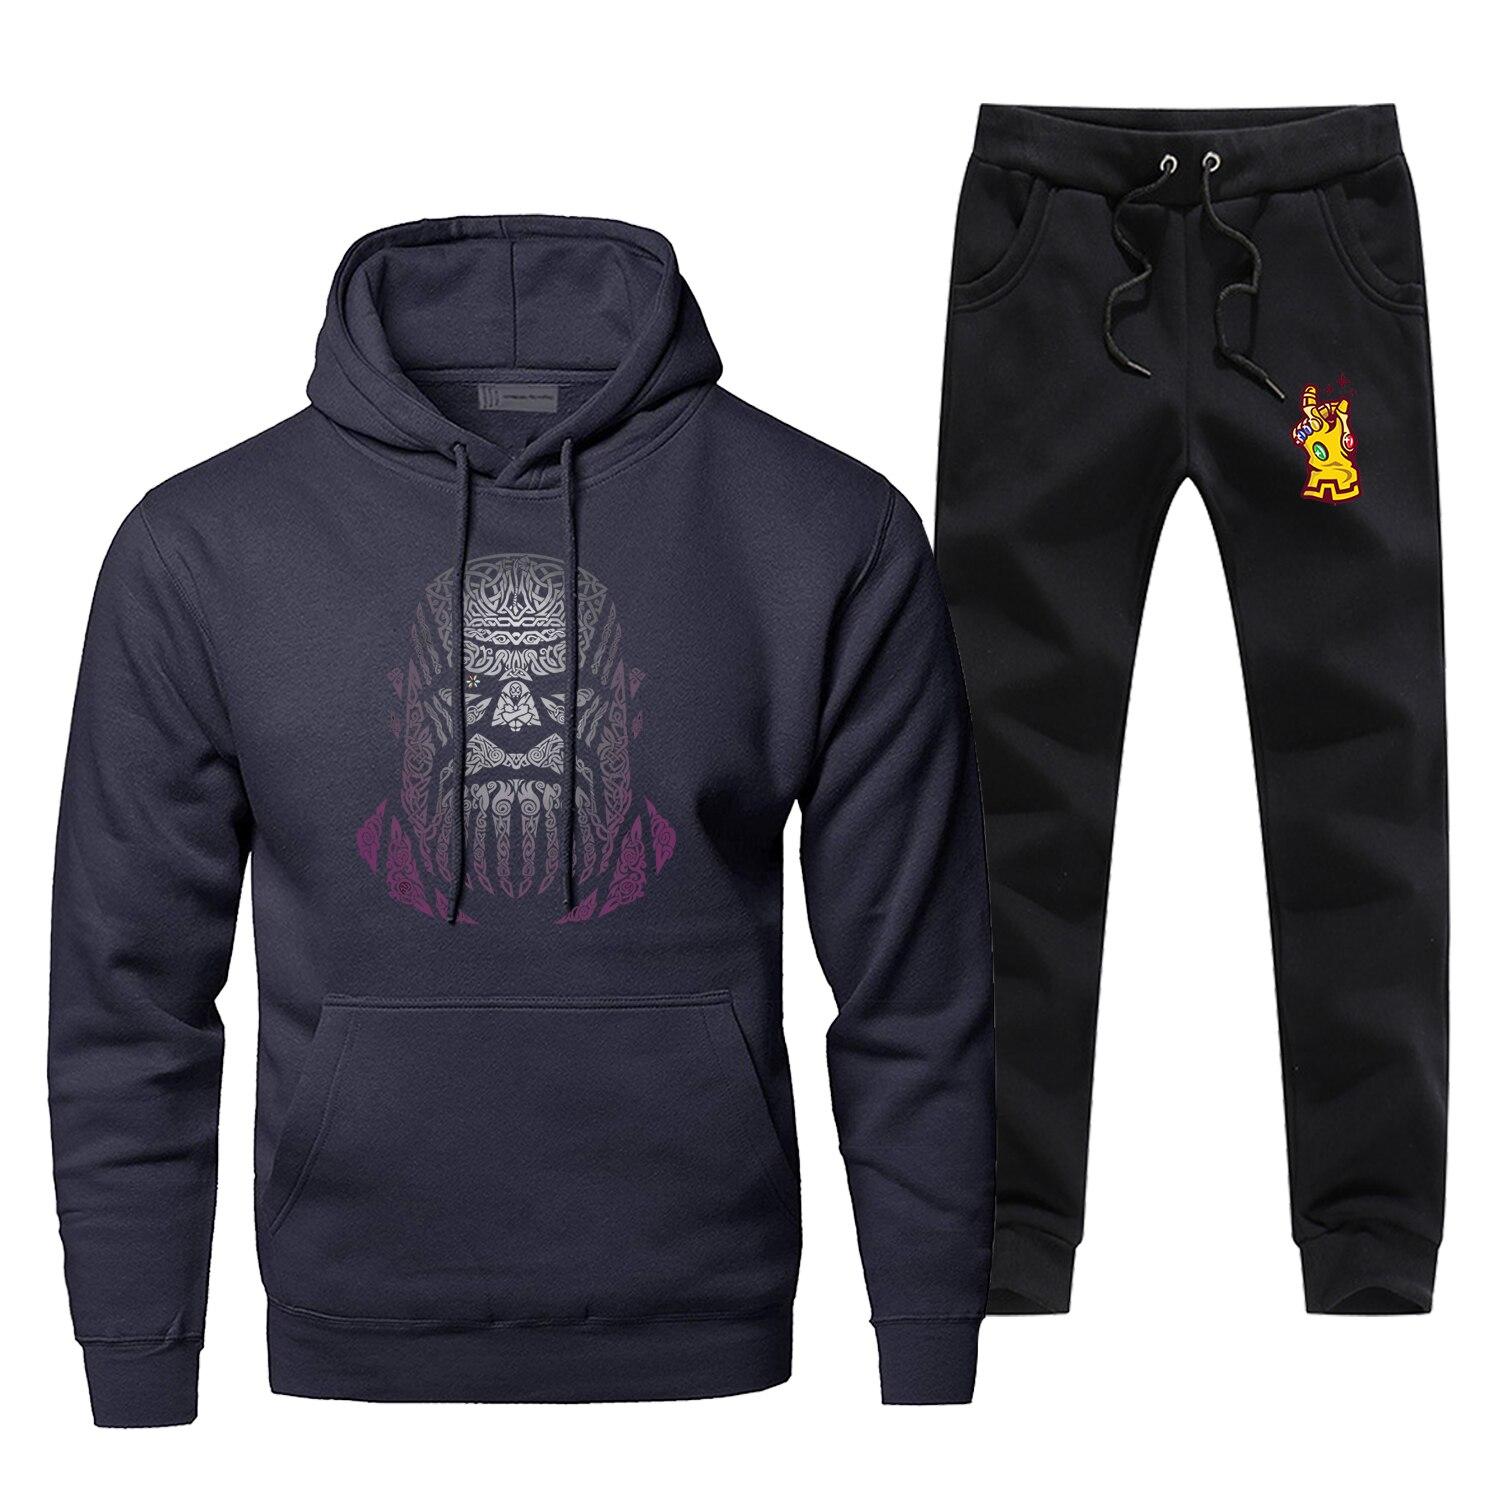 Thanos Hoodie Pants Set Infinity Gloves Men Sweatshirt Male Hoodies Sweatshirts Mens Sets Two Piece Pant Pullover Superhero Coat